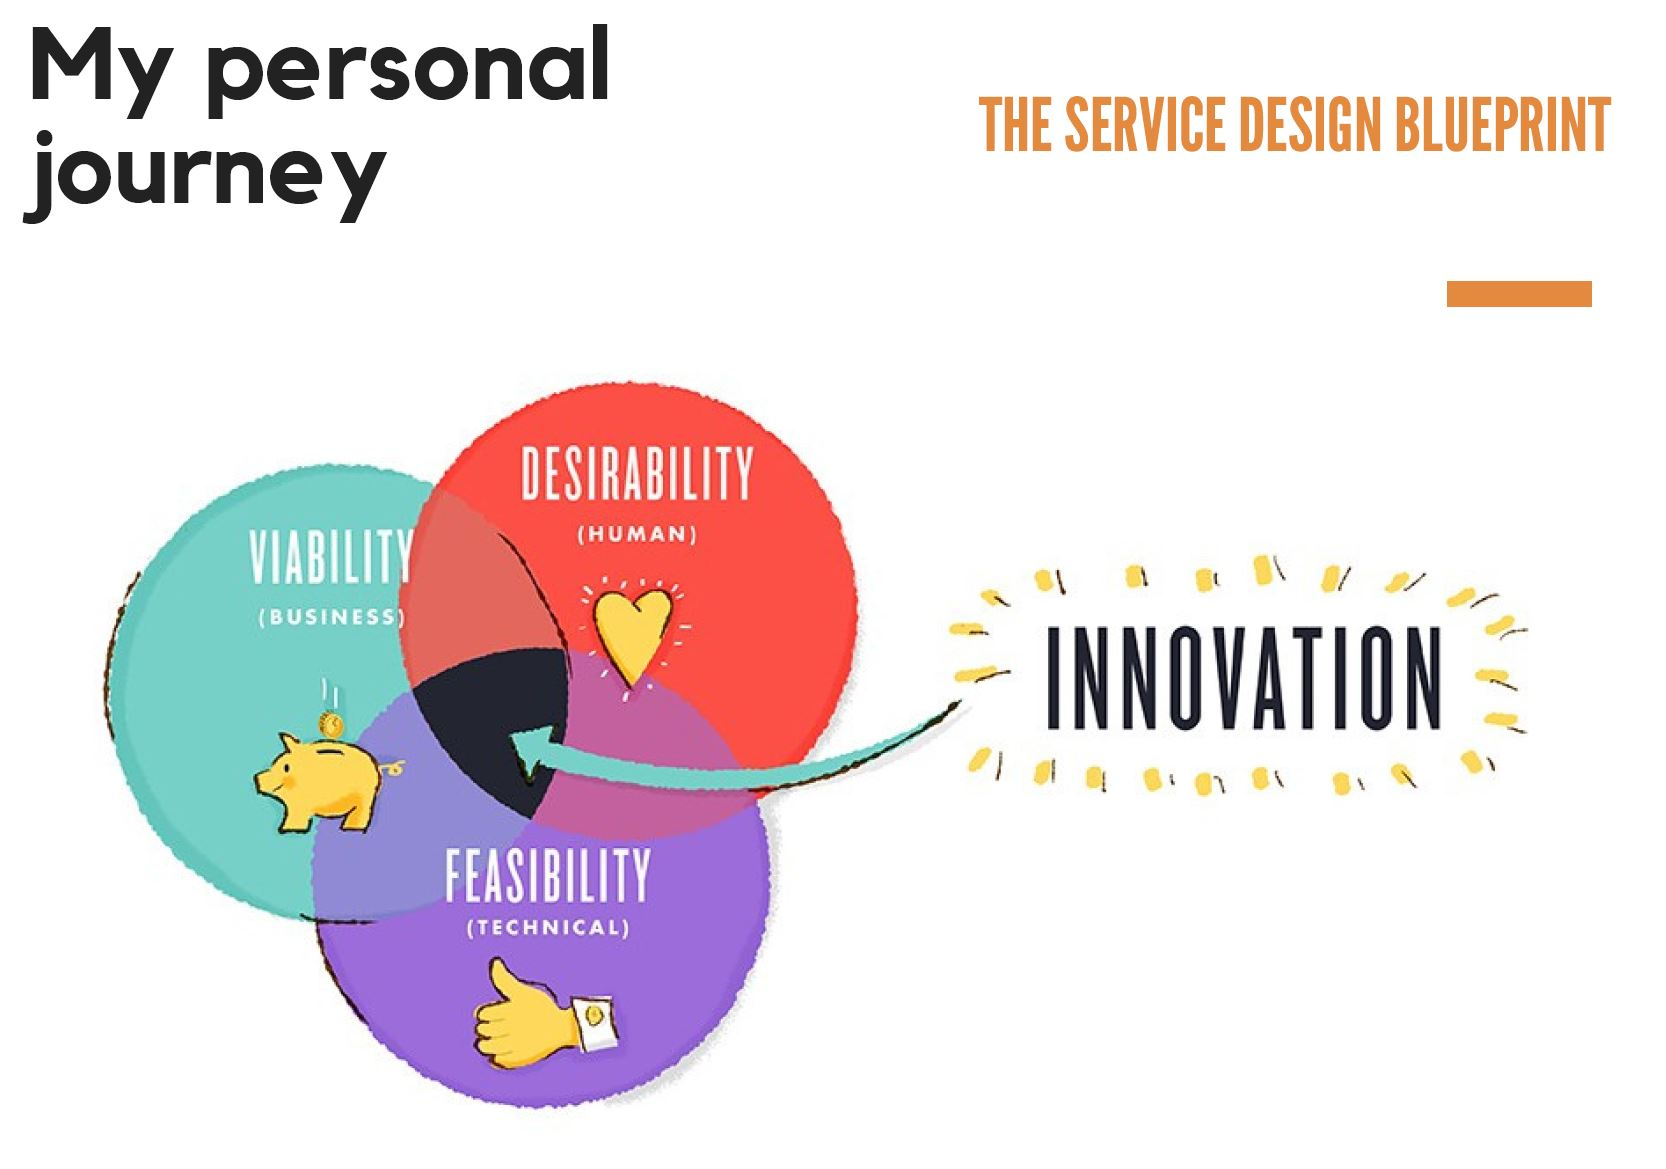 The service design blueprint 28 aug 2018 servicedesign1g malvernweather Choice Image